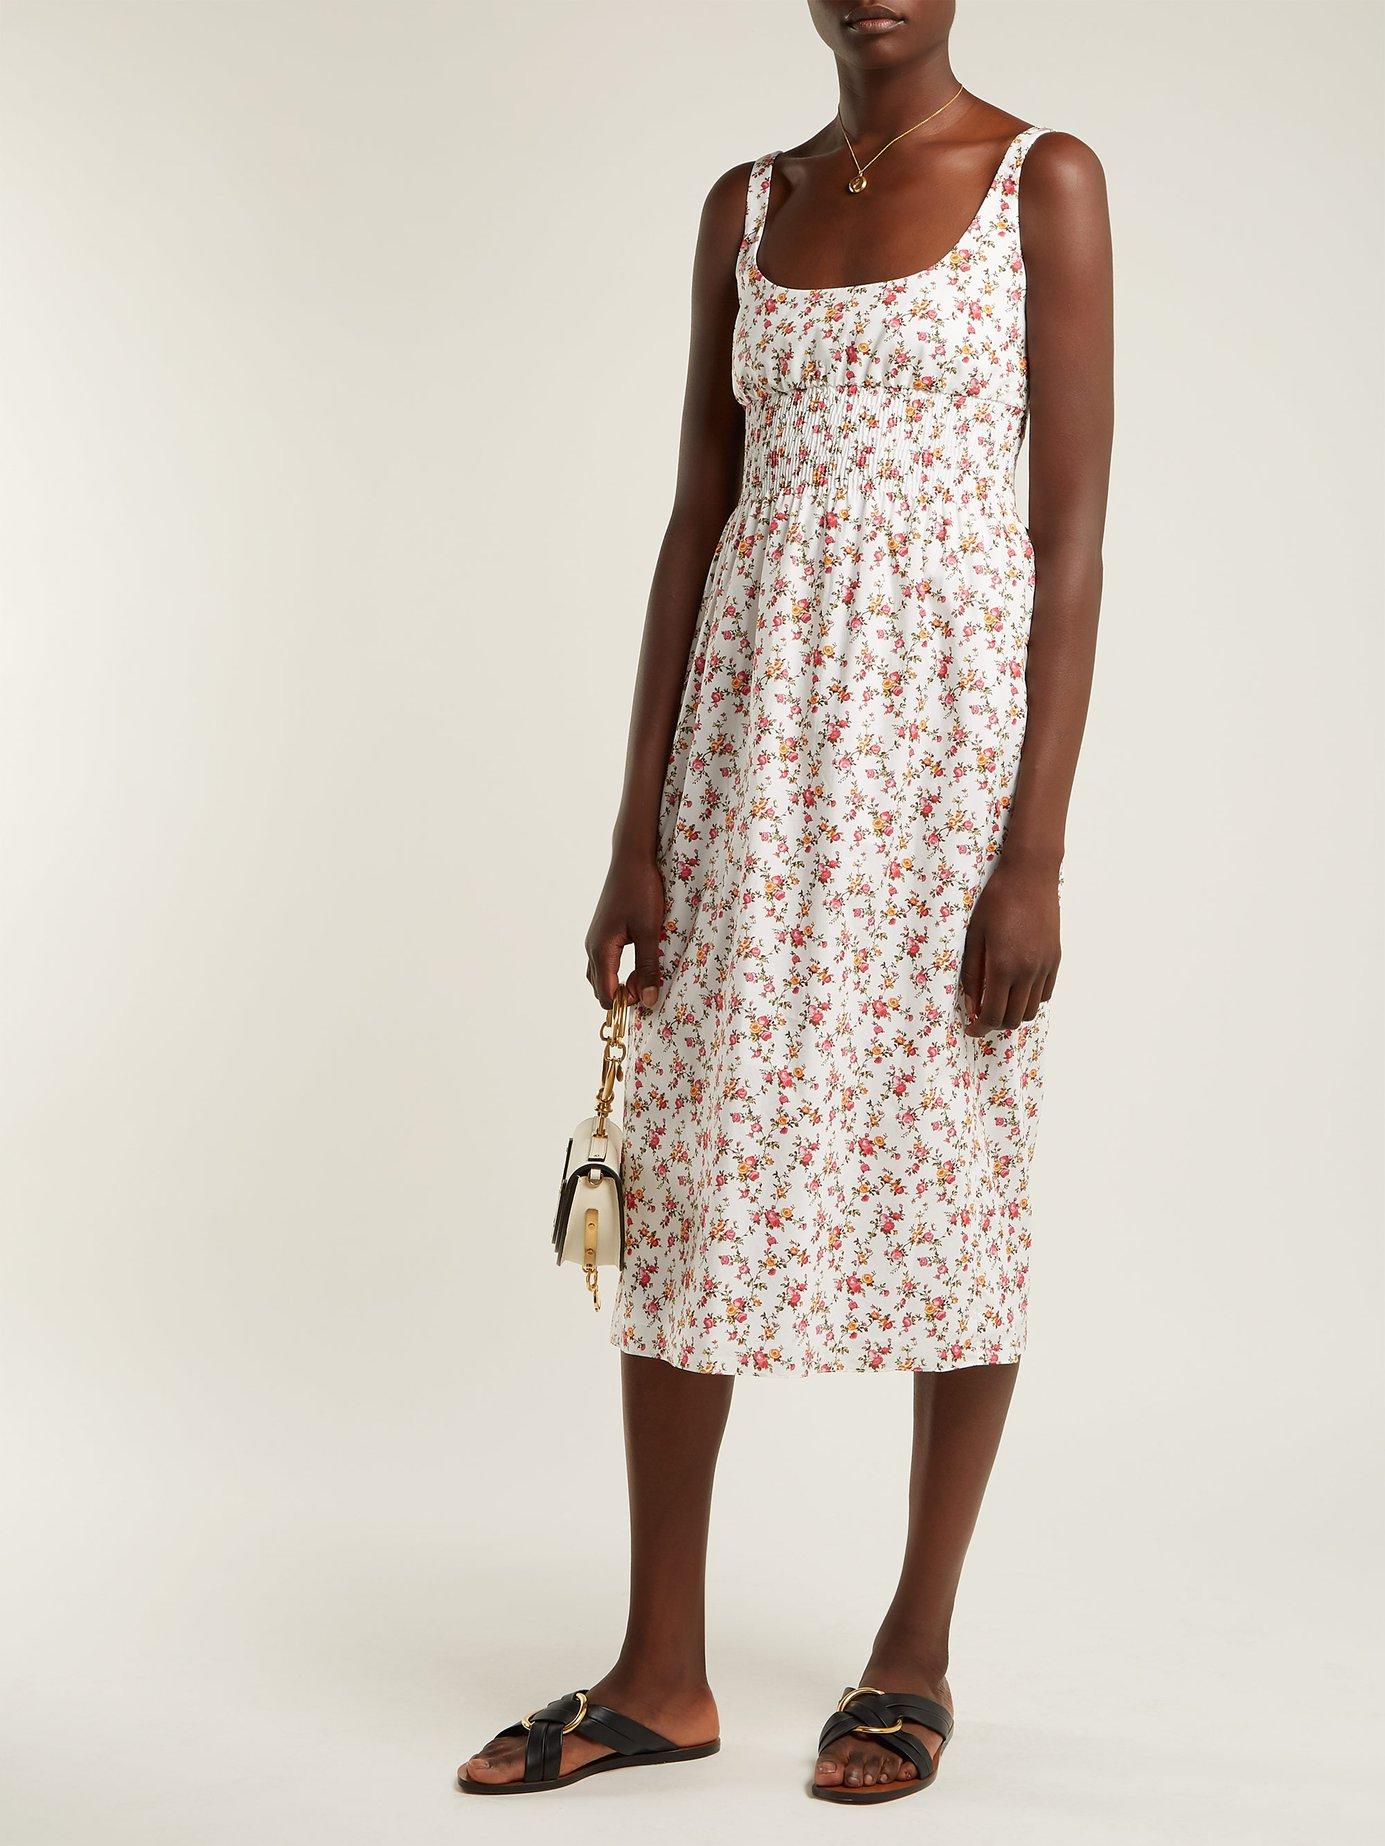 Giovanna floral-print cotton midi dress by Emilia Wickstead